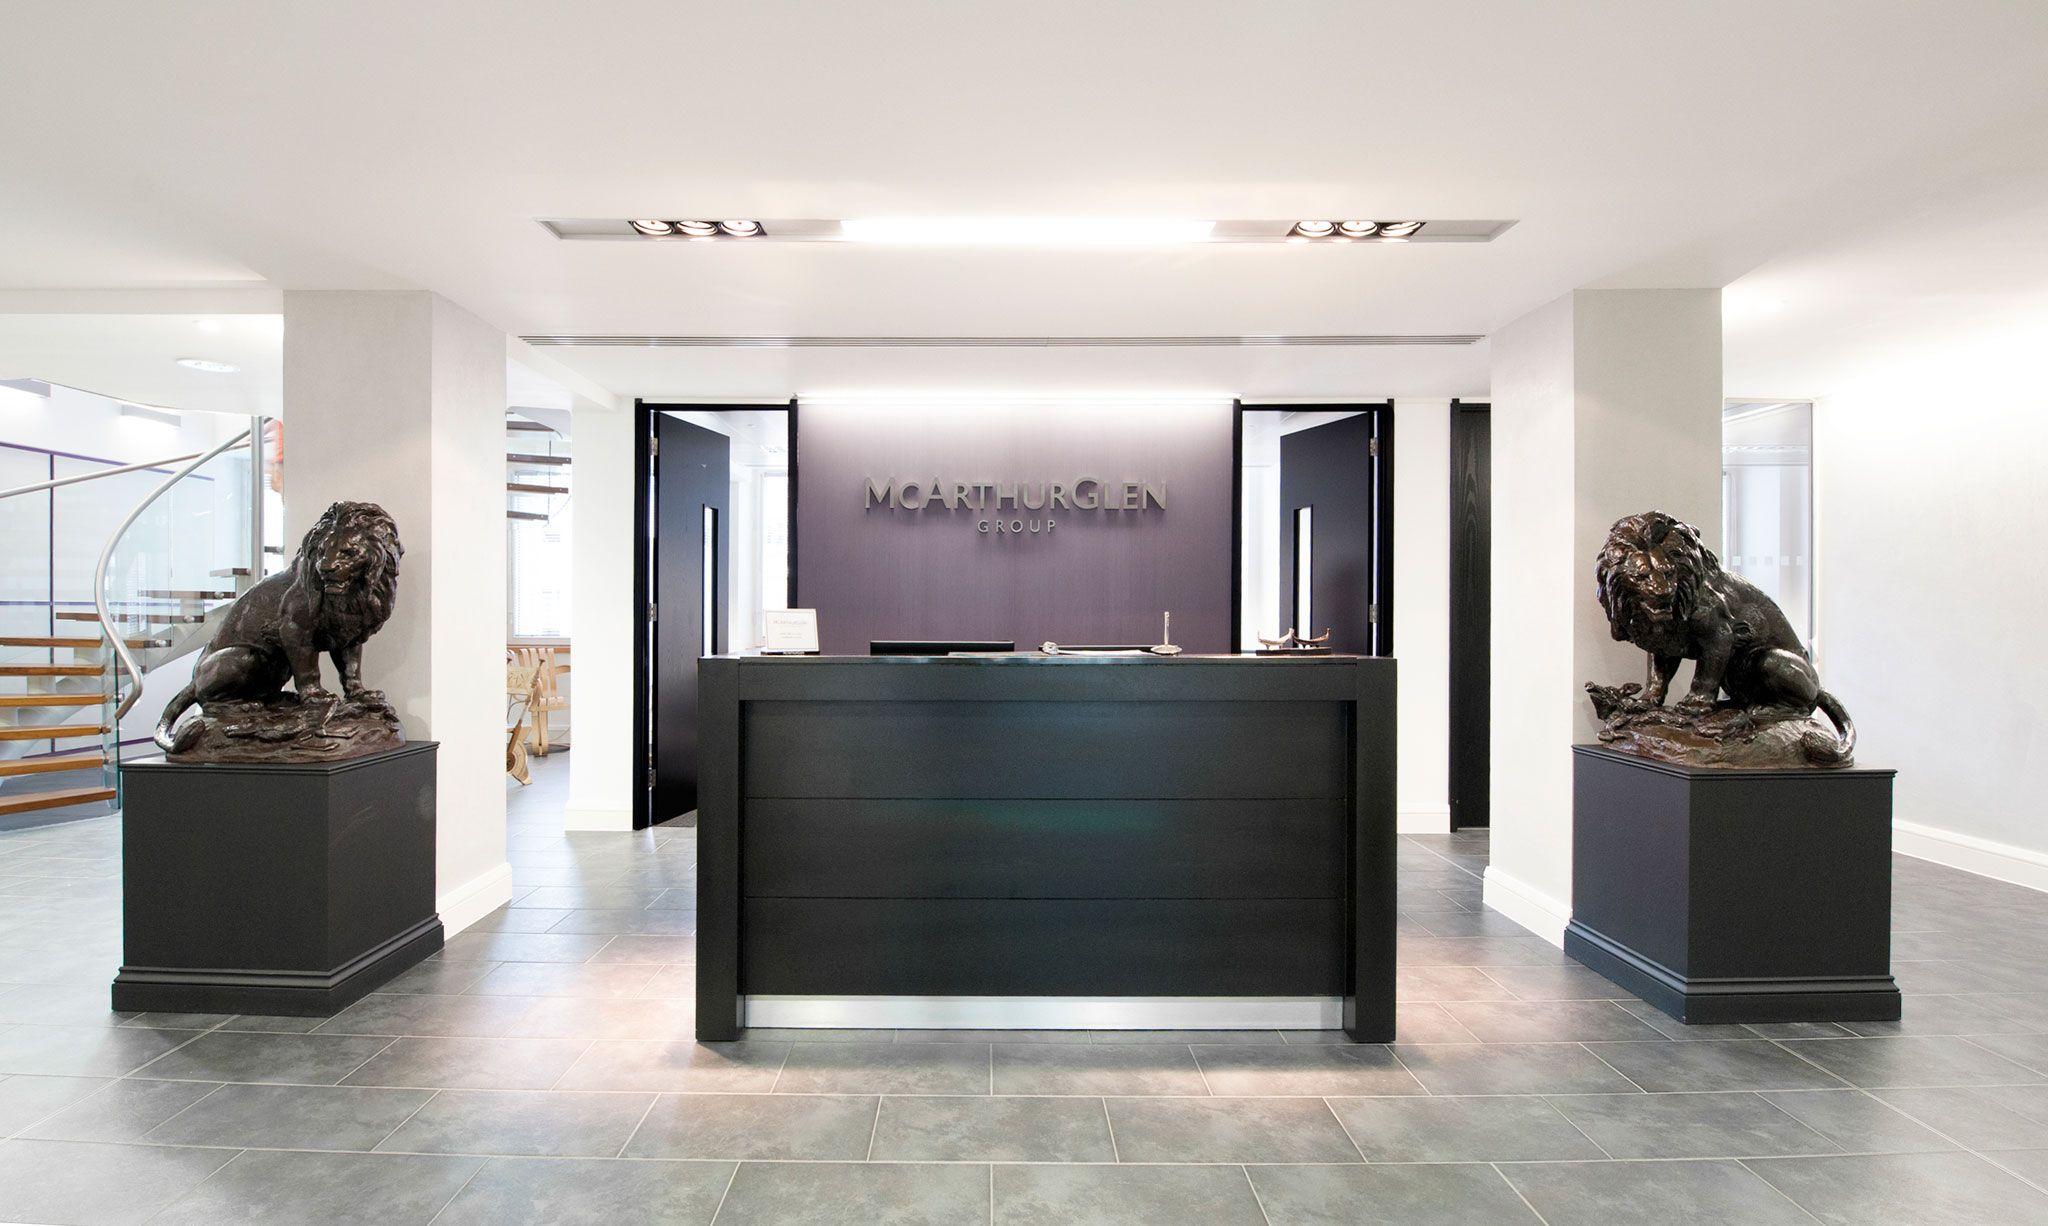 mcarthurglen uk offices nations house london main entrance